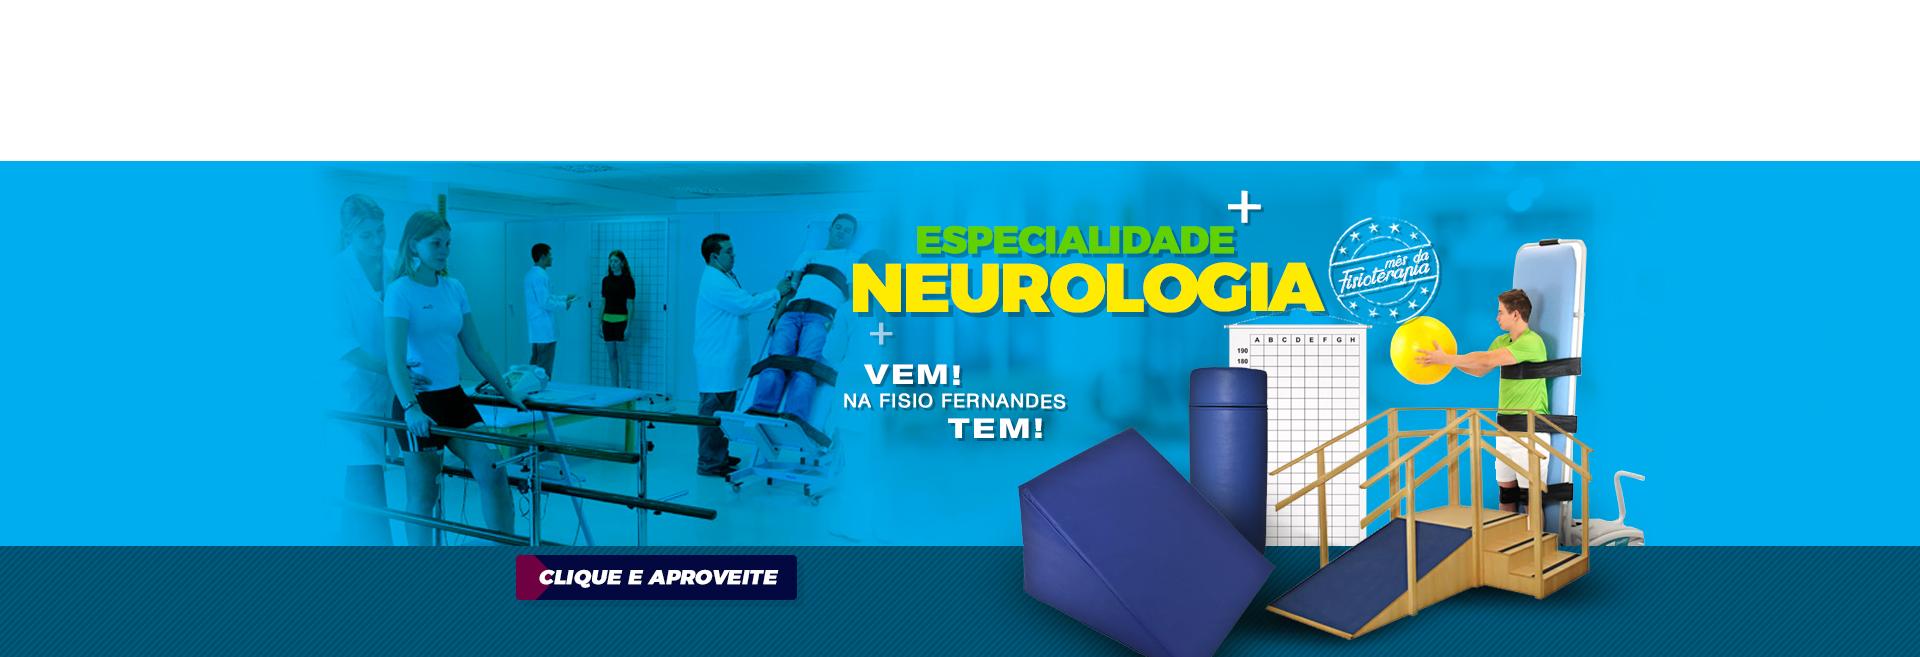 especialidades- neurologia